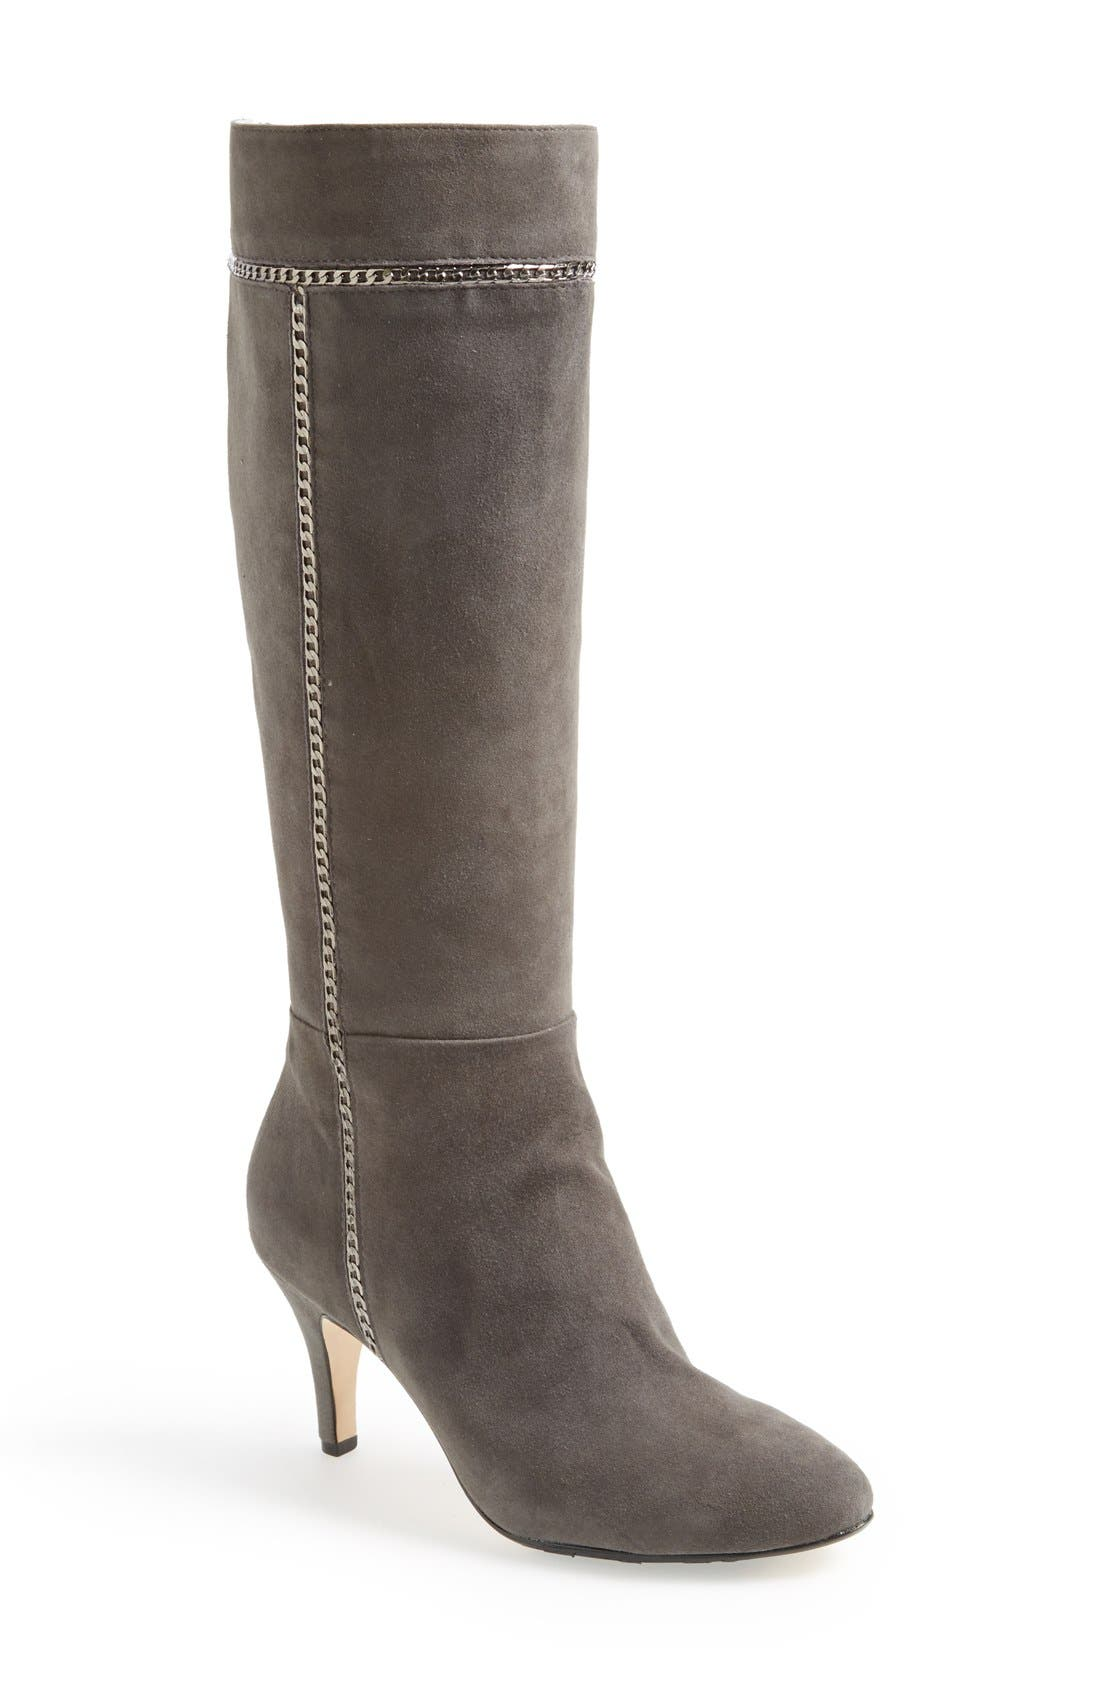 Alternate Image 1 Selected - Taryn Rose 'Treyes' Tall Suede Boot (Women)